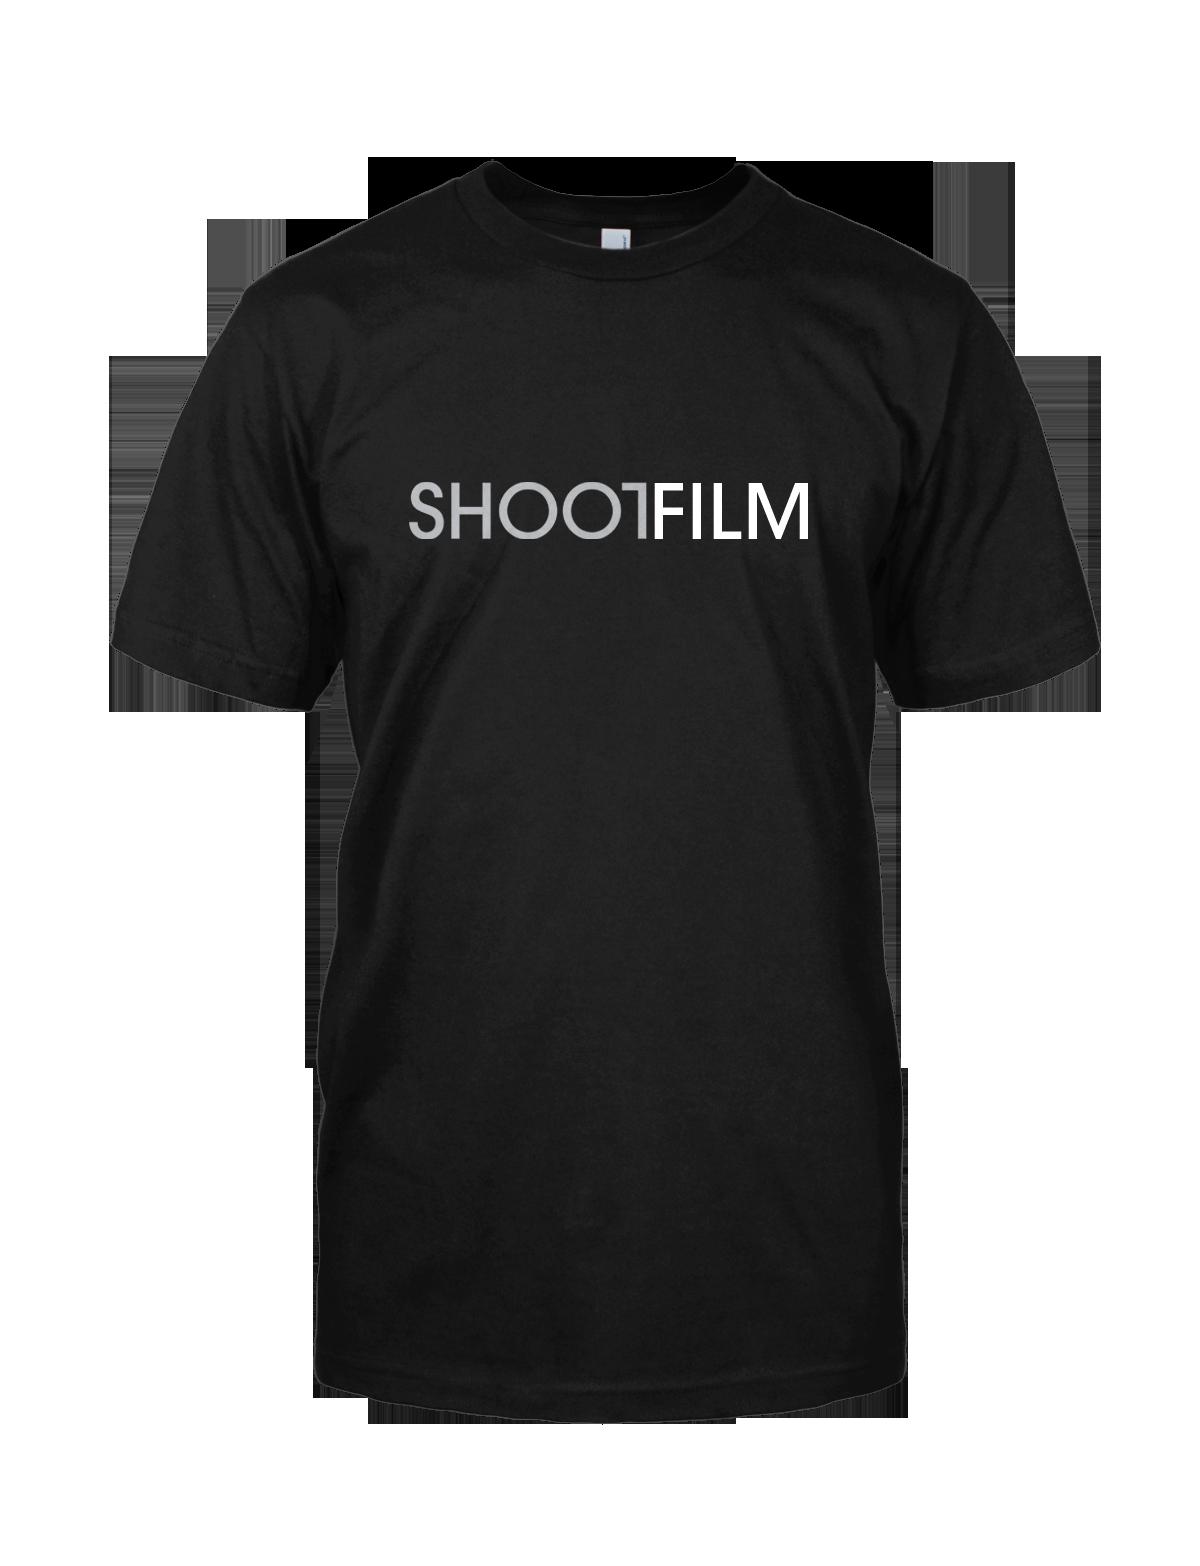 Shoot Film shirts from Shoot Tokyo